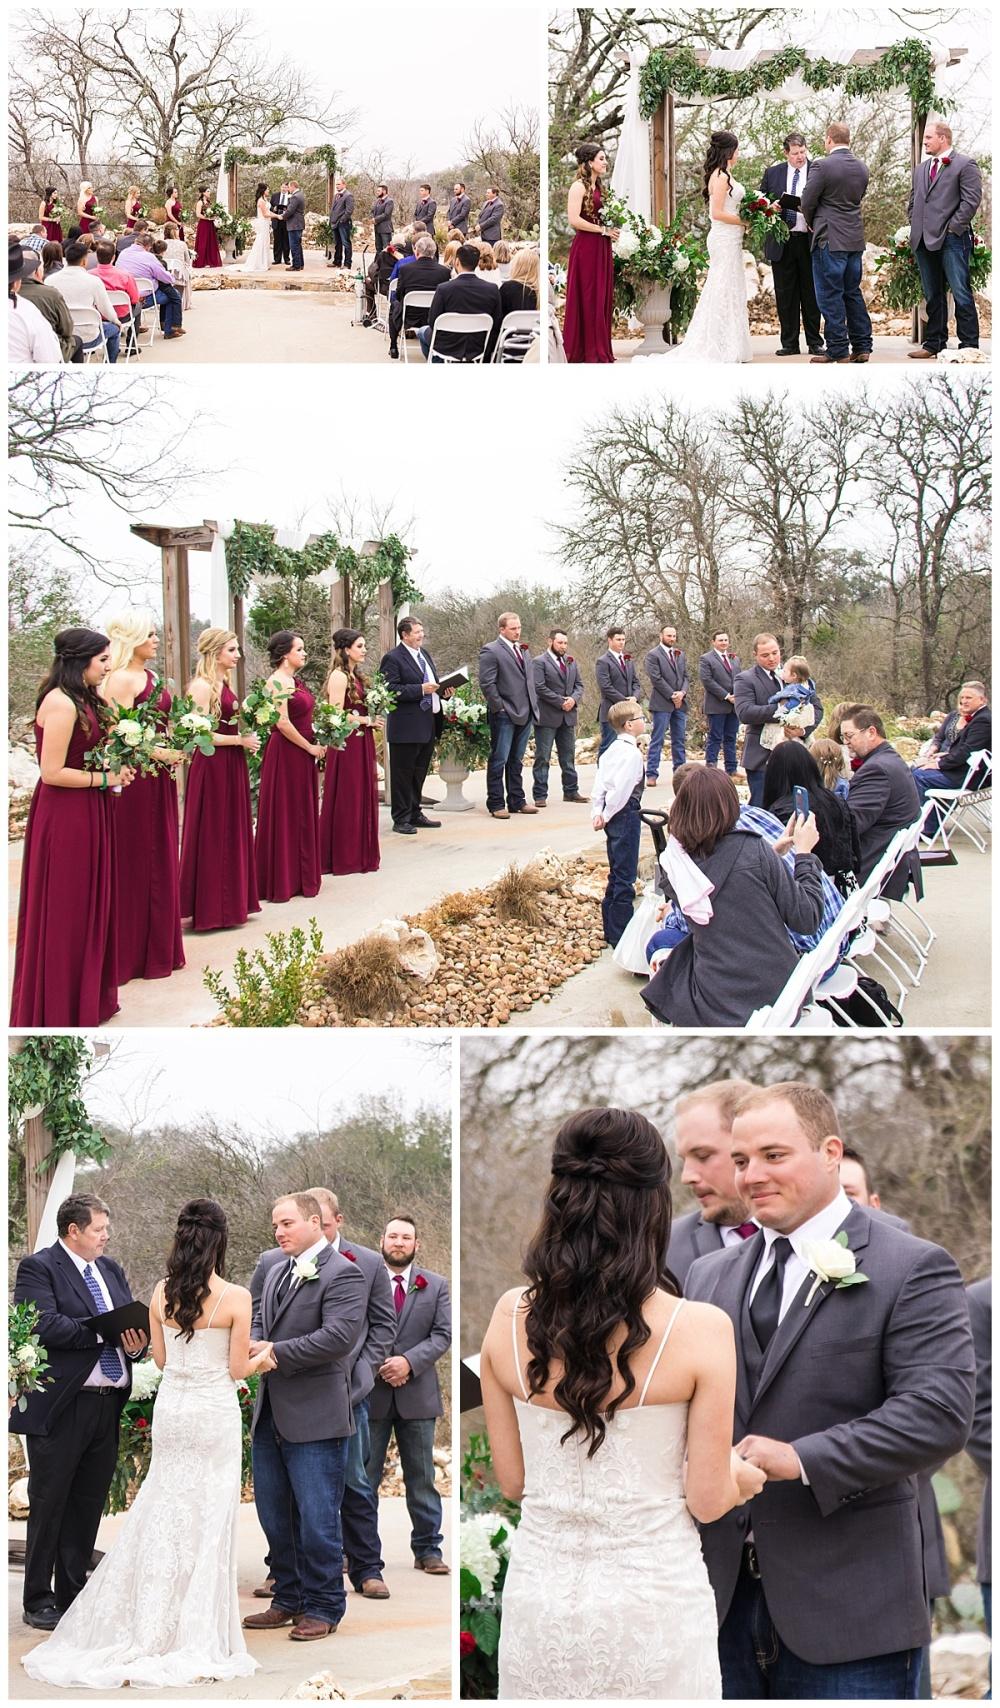 Carly-Barton-Photography-Geronimo-Oaks-Wedding-Venue-Texas-Hill-Country-Ronnie-Sarah_0097.jpg